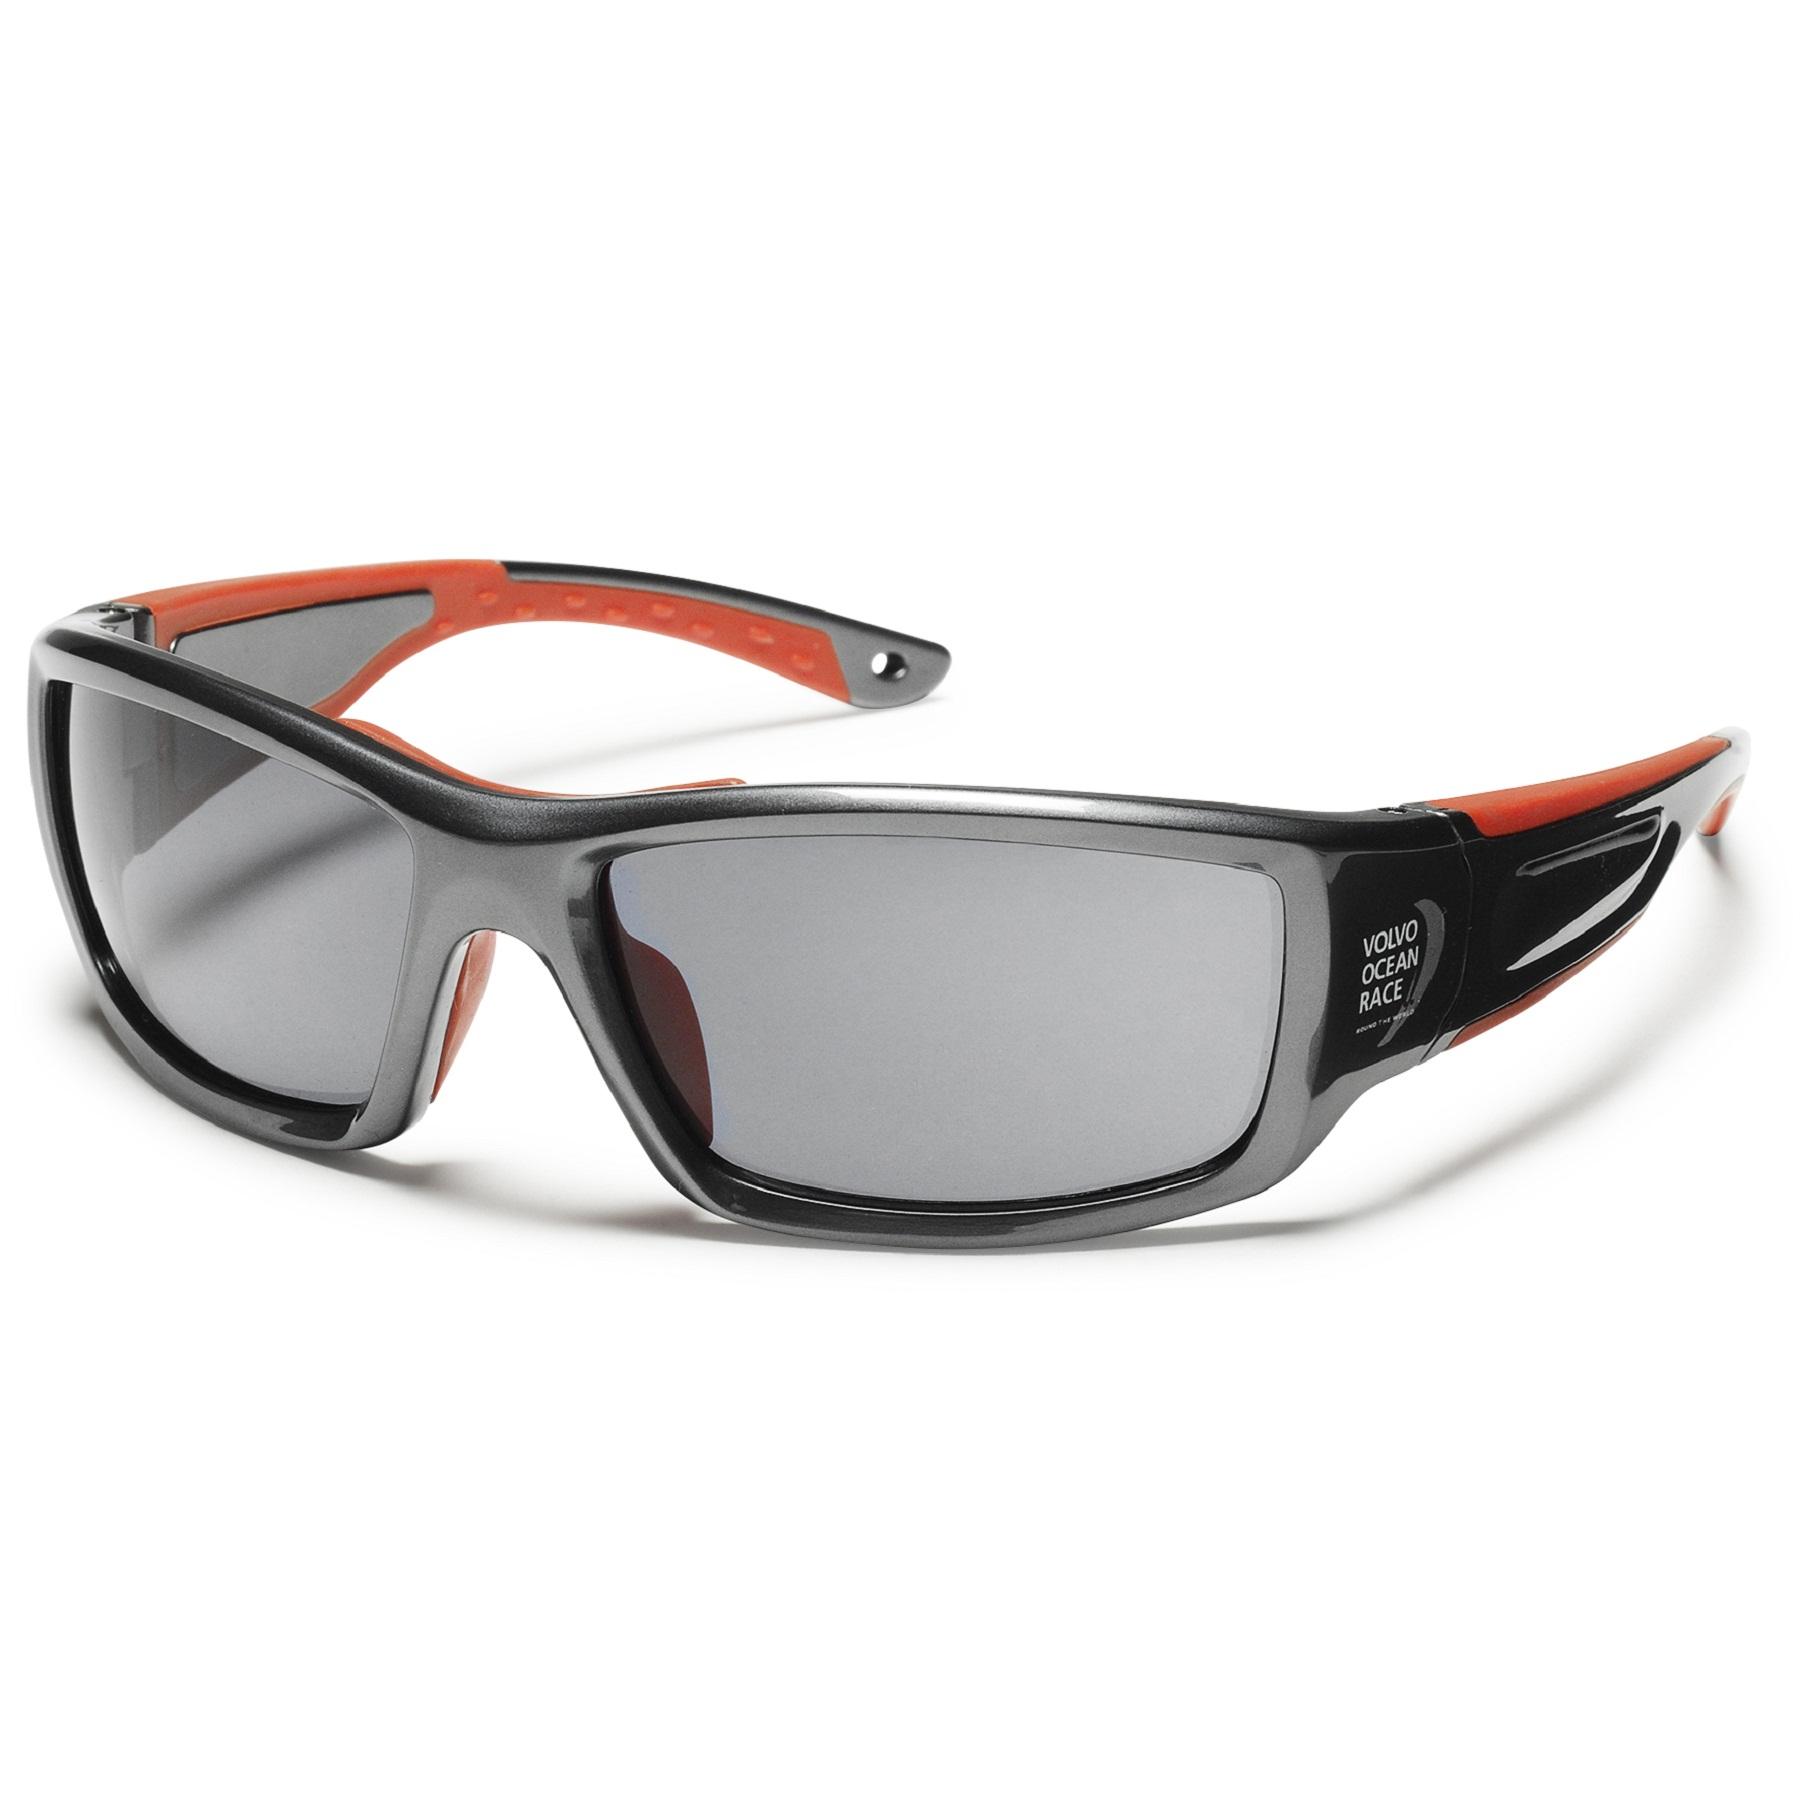 Volvo car lifestyle collection shop volvo ocean race sunglasses 5 - Ocean sunglasses ...